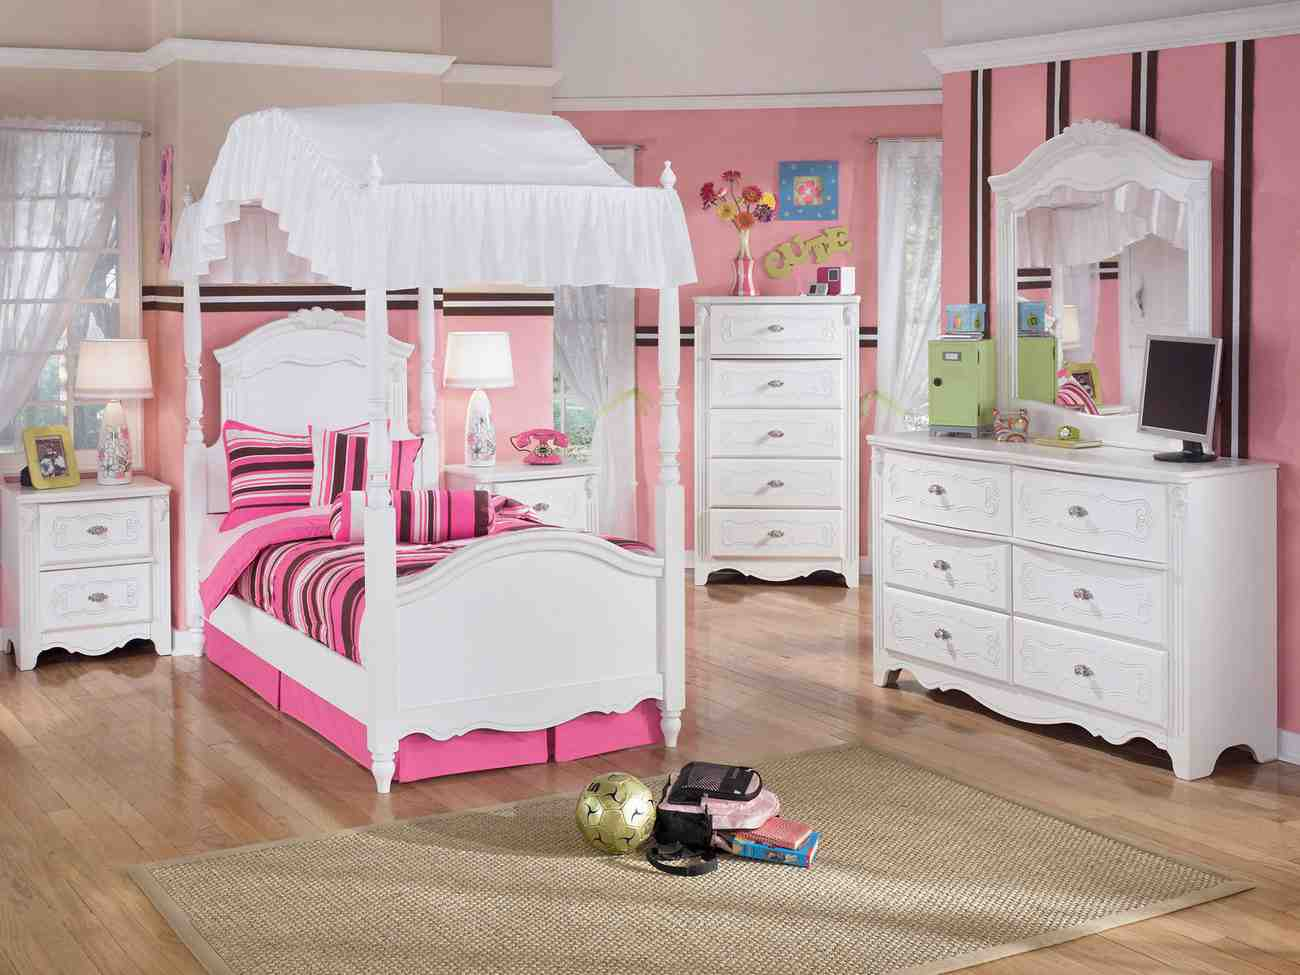 white twin bedroom set home furniture design. Black Bedroom Furniture Sets. Home Design Ideas